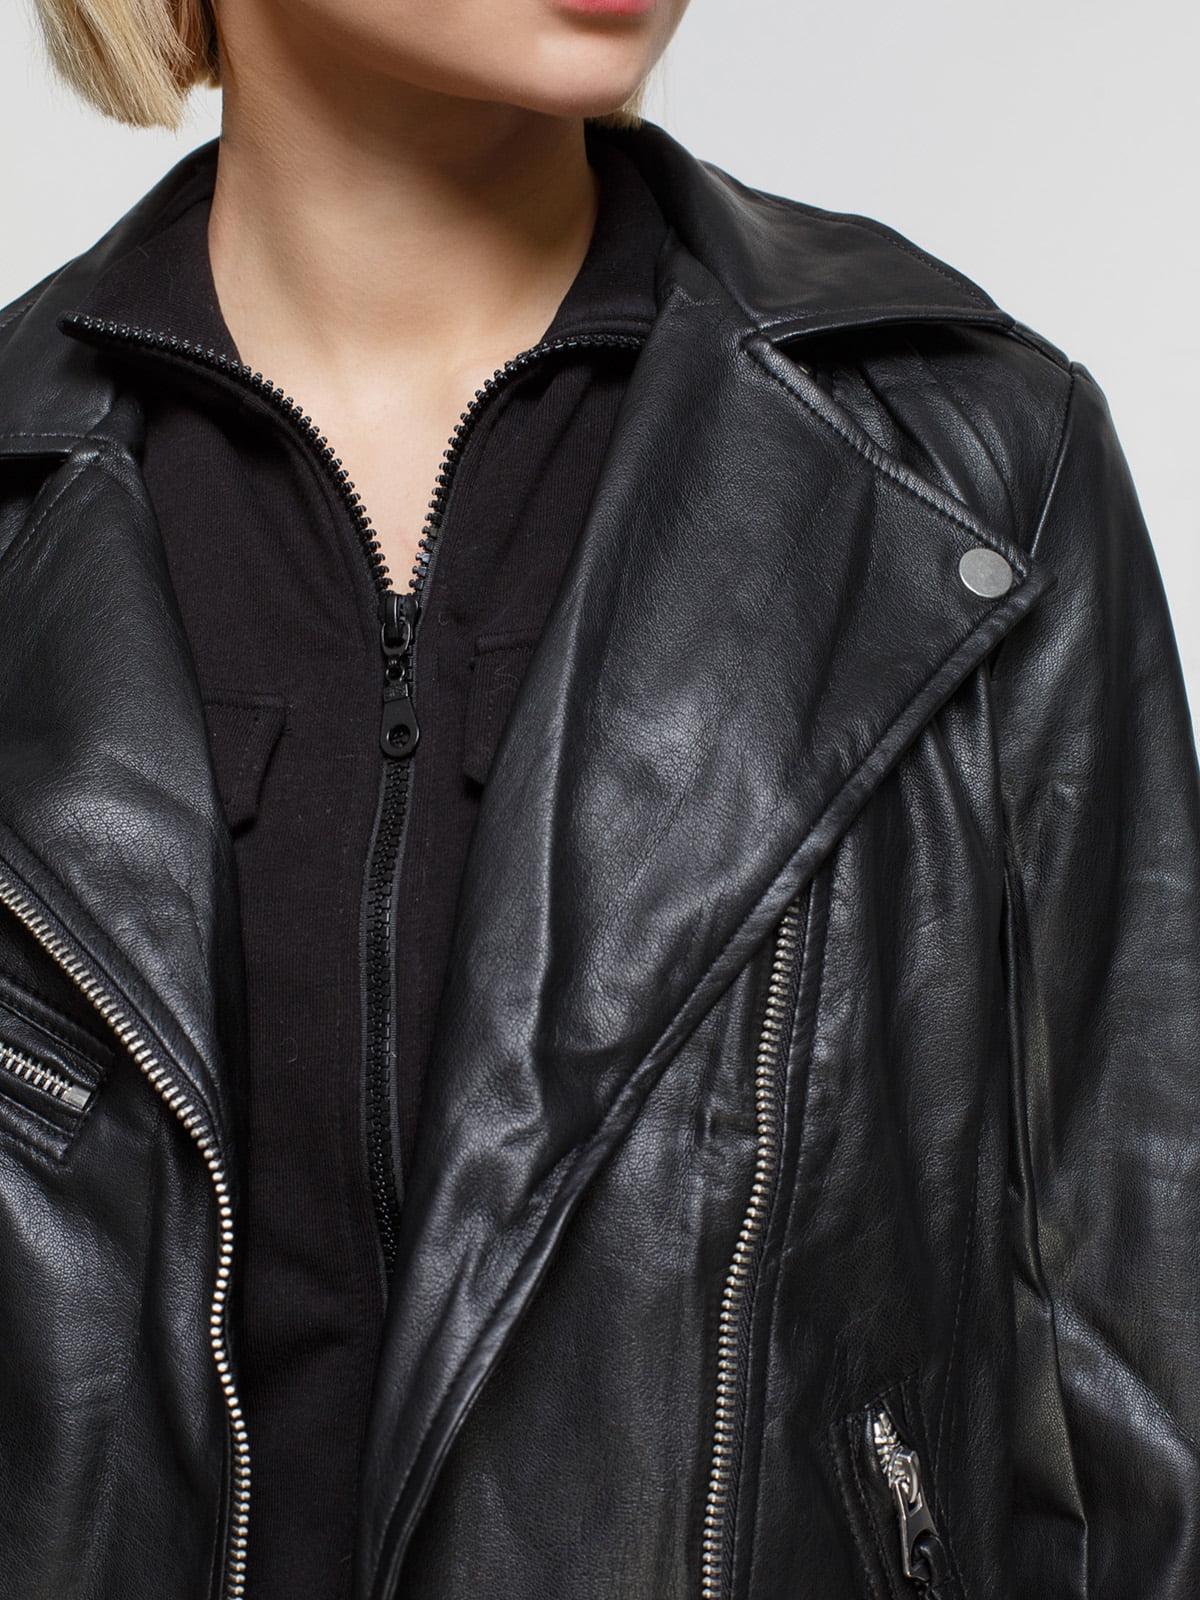 Куртка чорна   4725523   фото 4